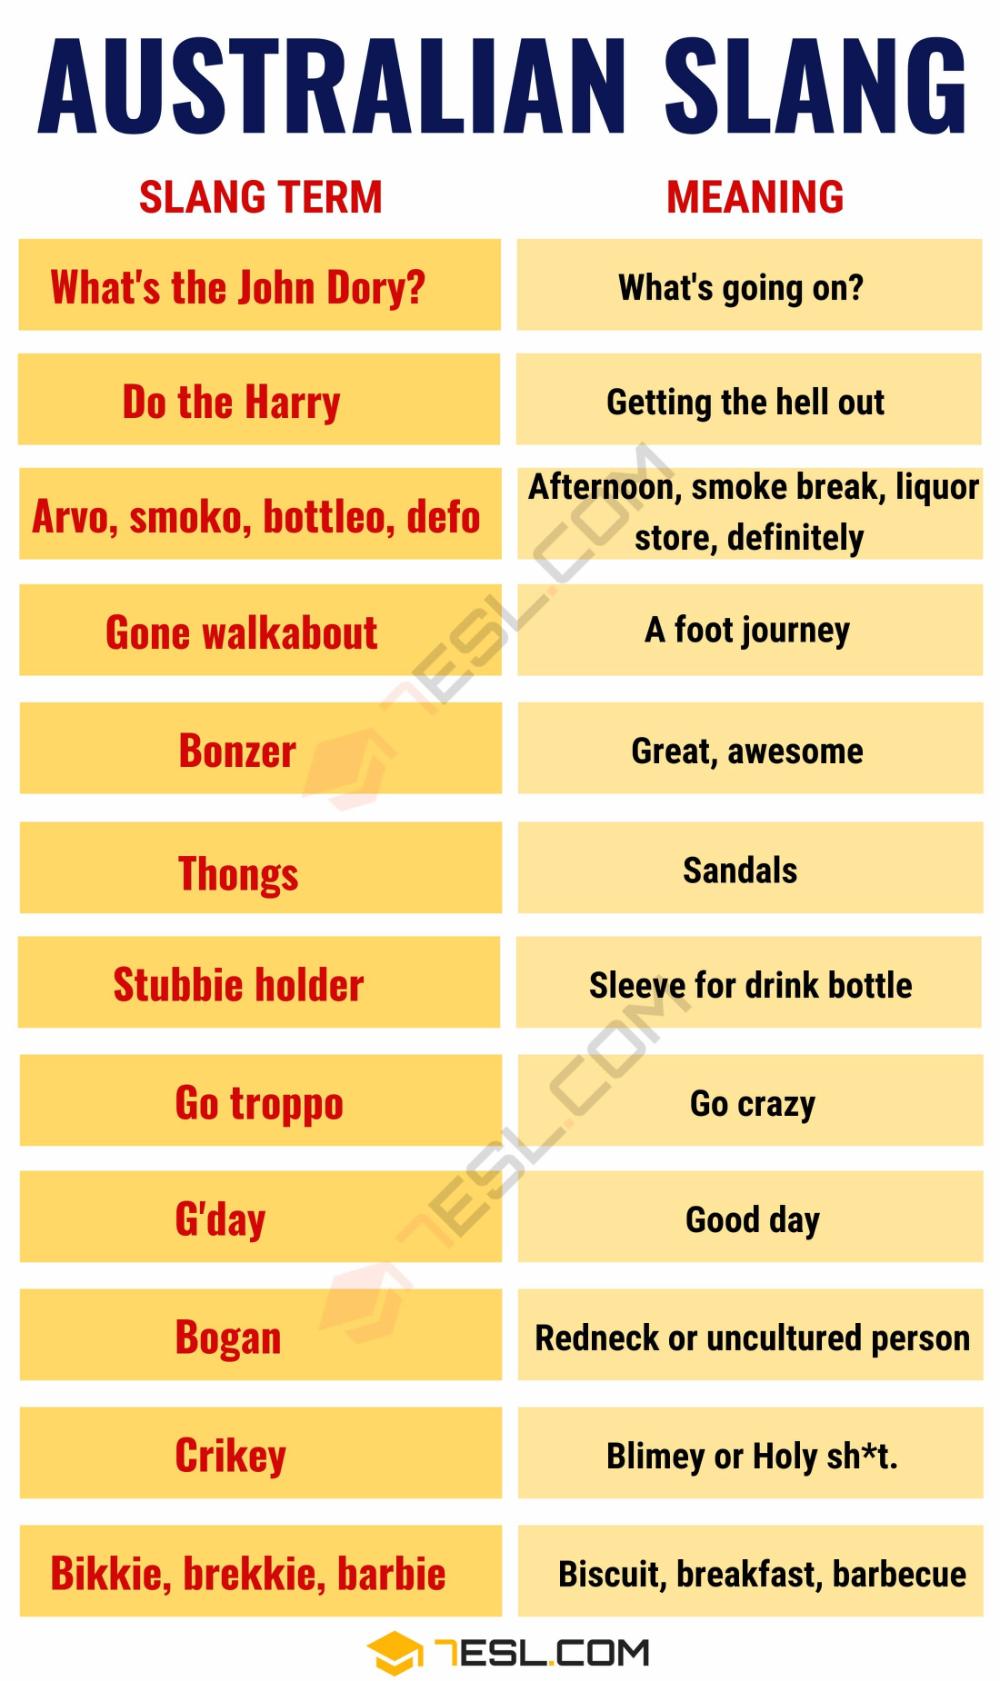 Australian Slang 23 Popular Aussie Slang Words You Need To Know 7esl British Slang Words Australian Slang Slang Words